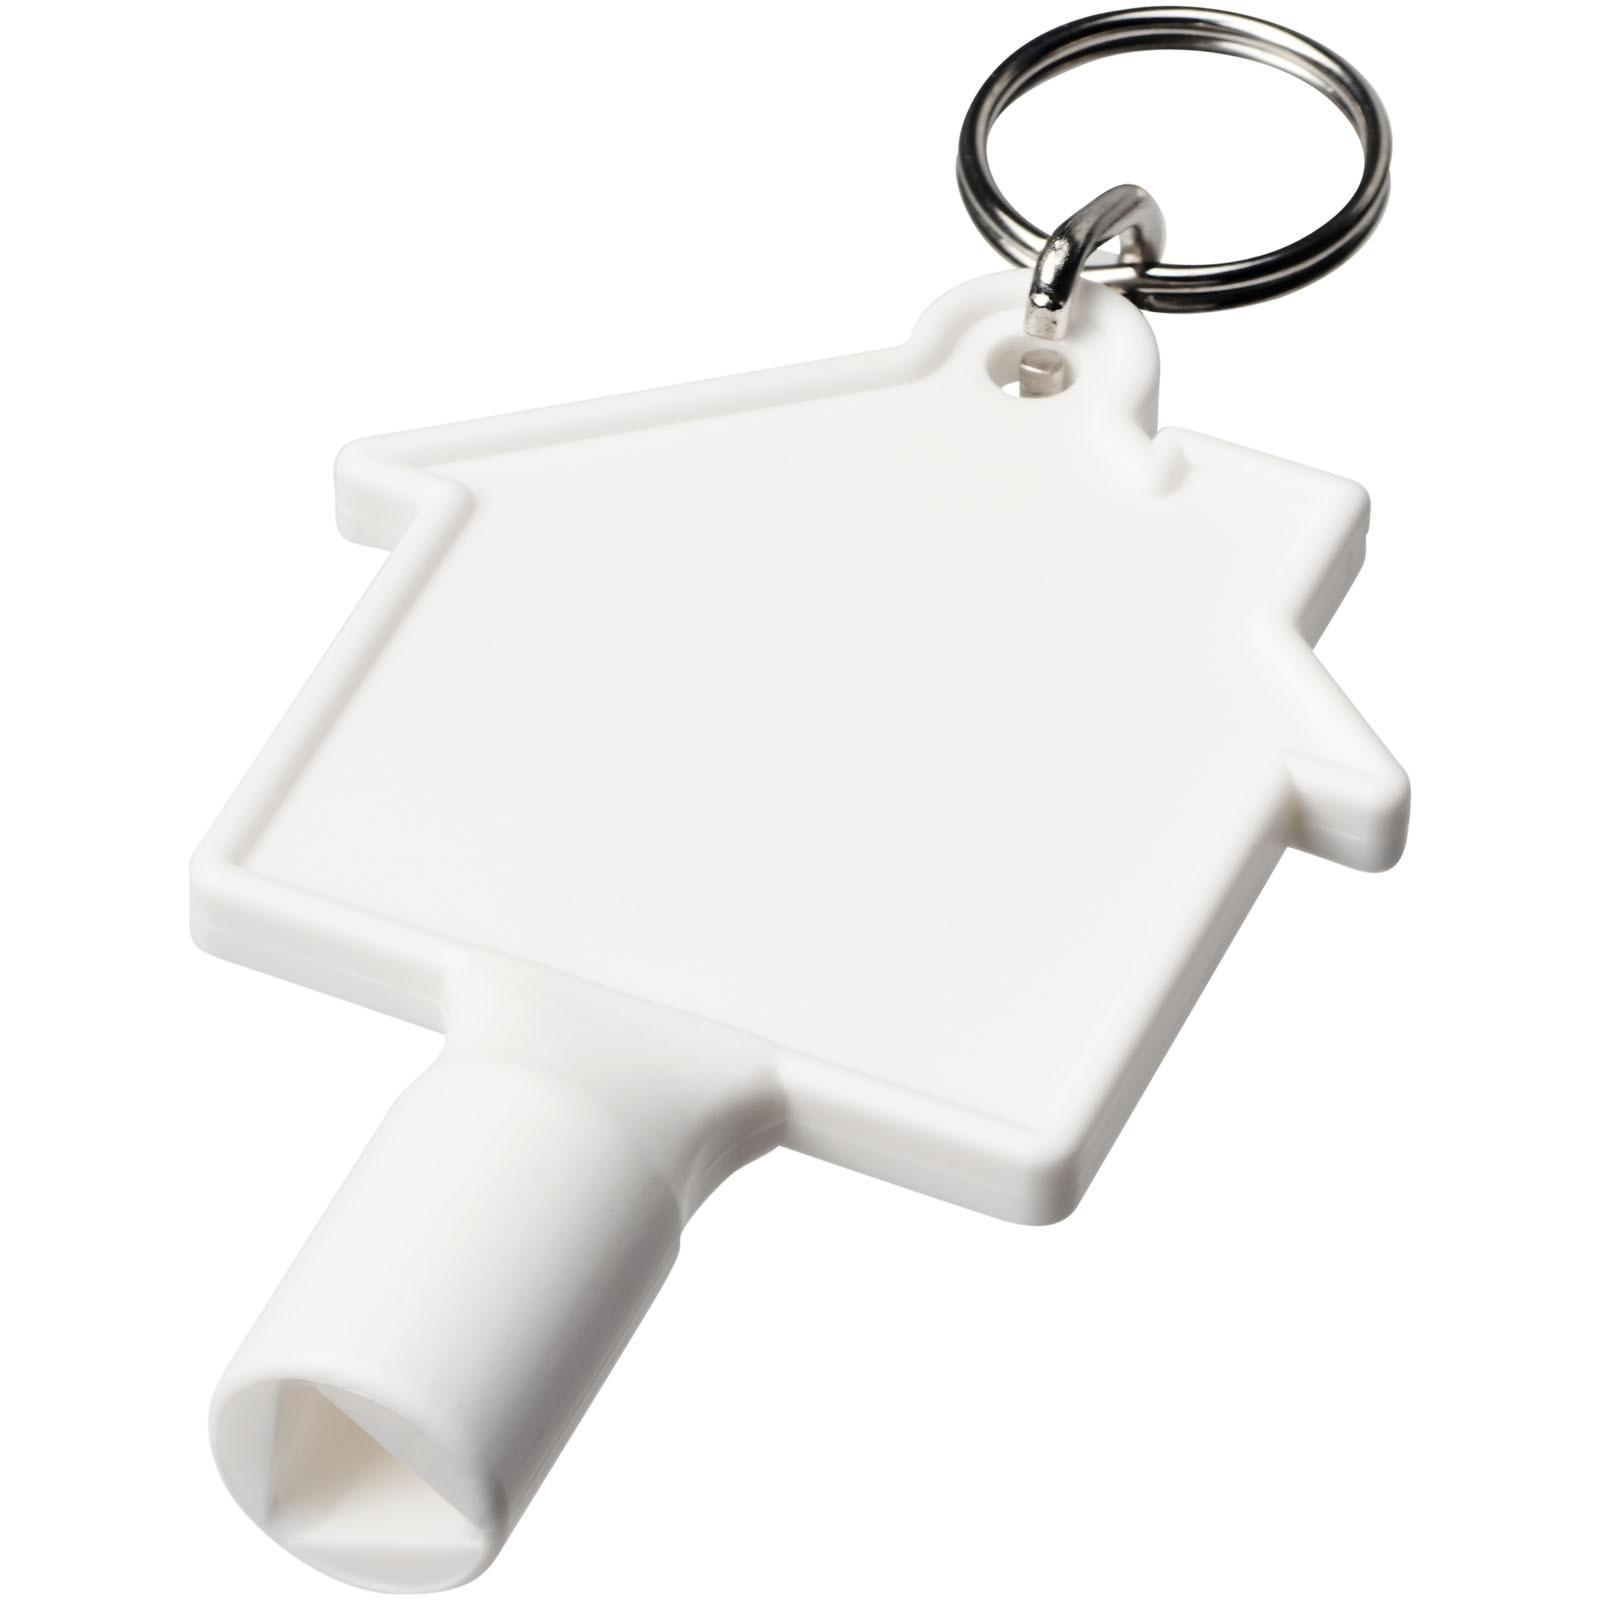 Klíčenkový klíč na měřidla Maximilian ve tvaru domu - Bílá